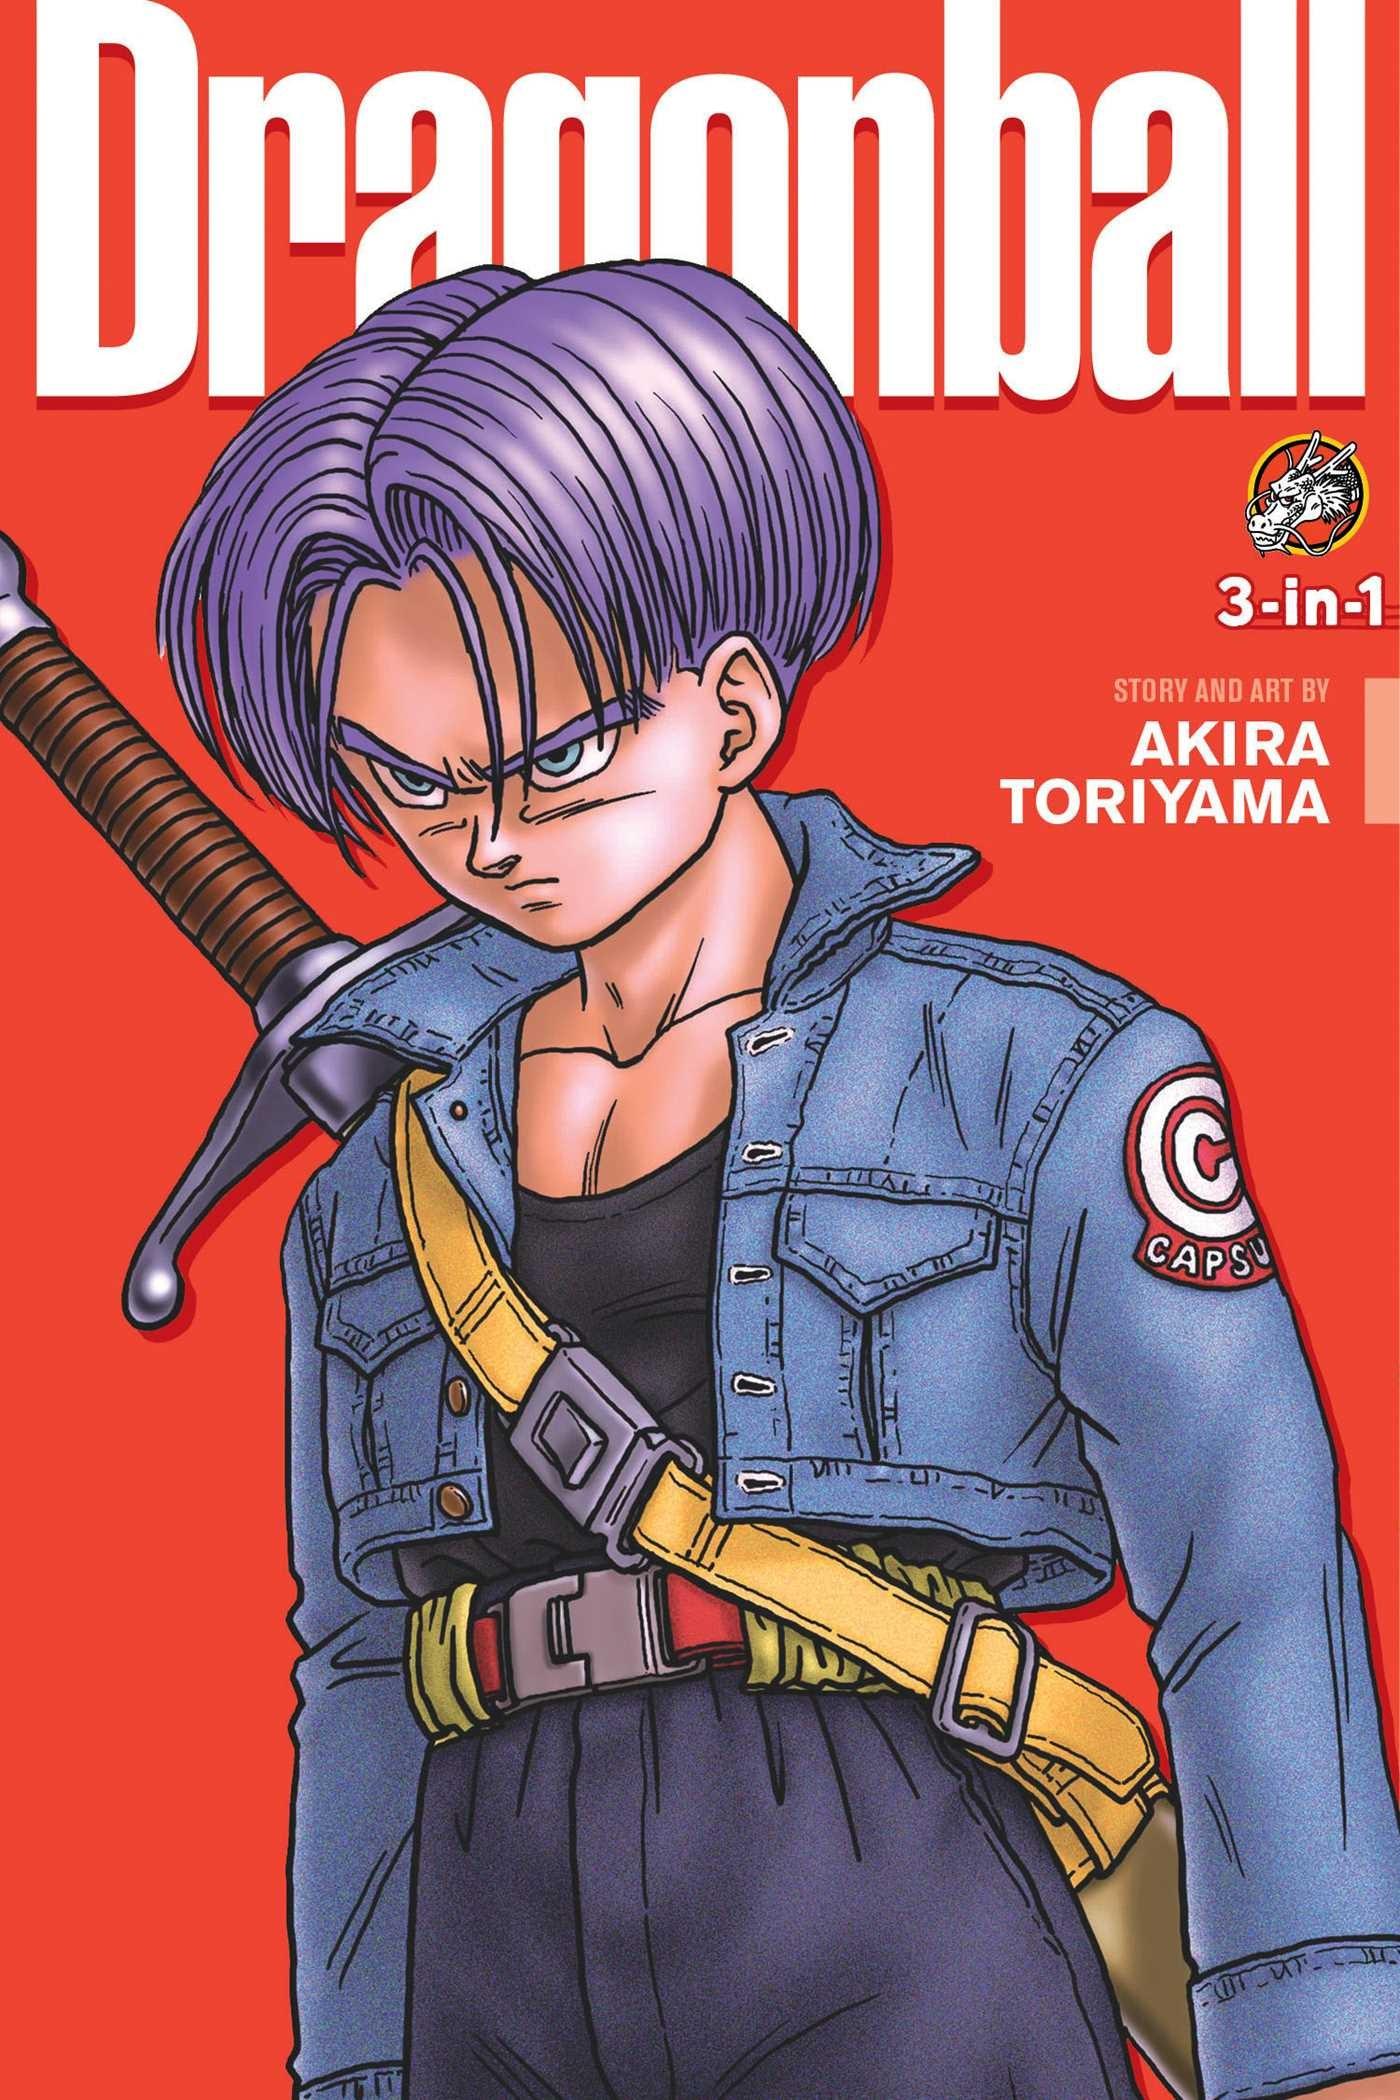 Dragon Ball (3-in-1 Edition), Vol. 10 by Akira Toriyama